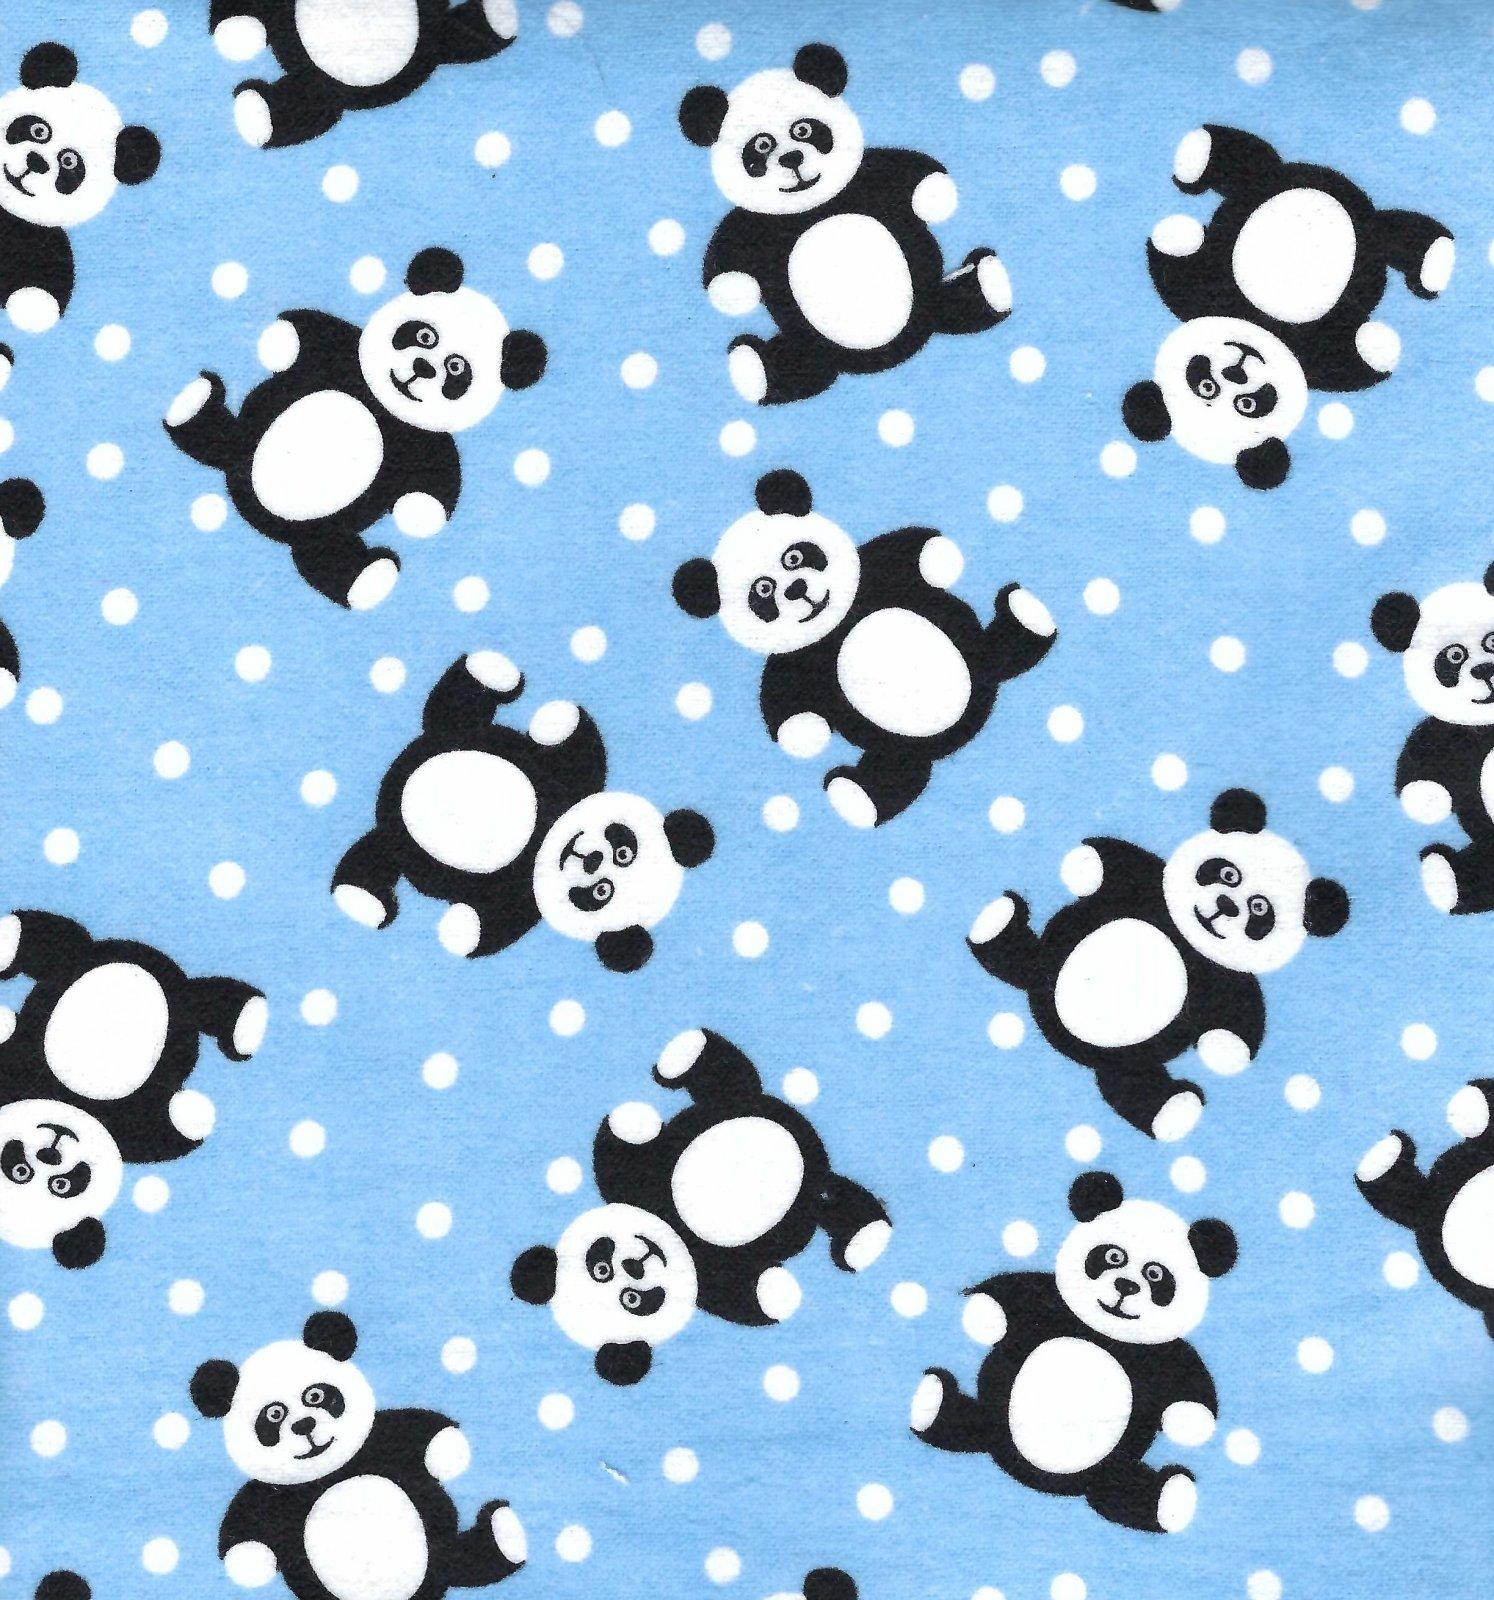 Flannel Hemstitched - Pandas on Blue